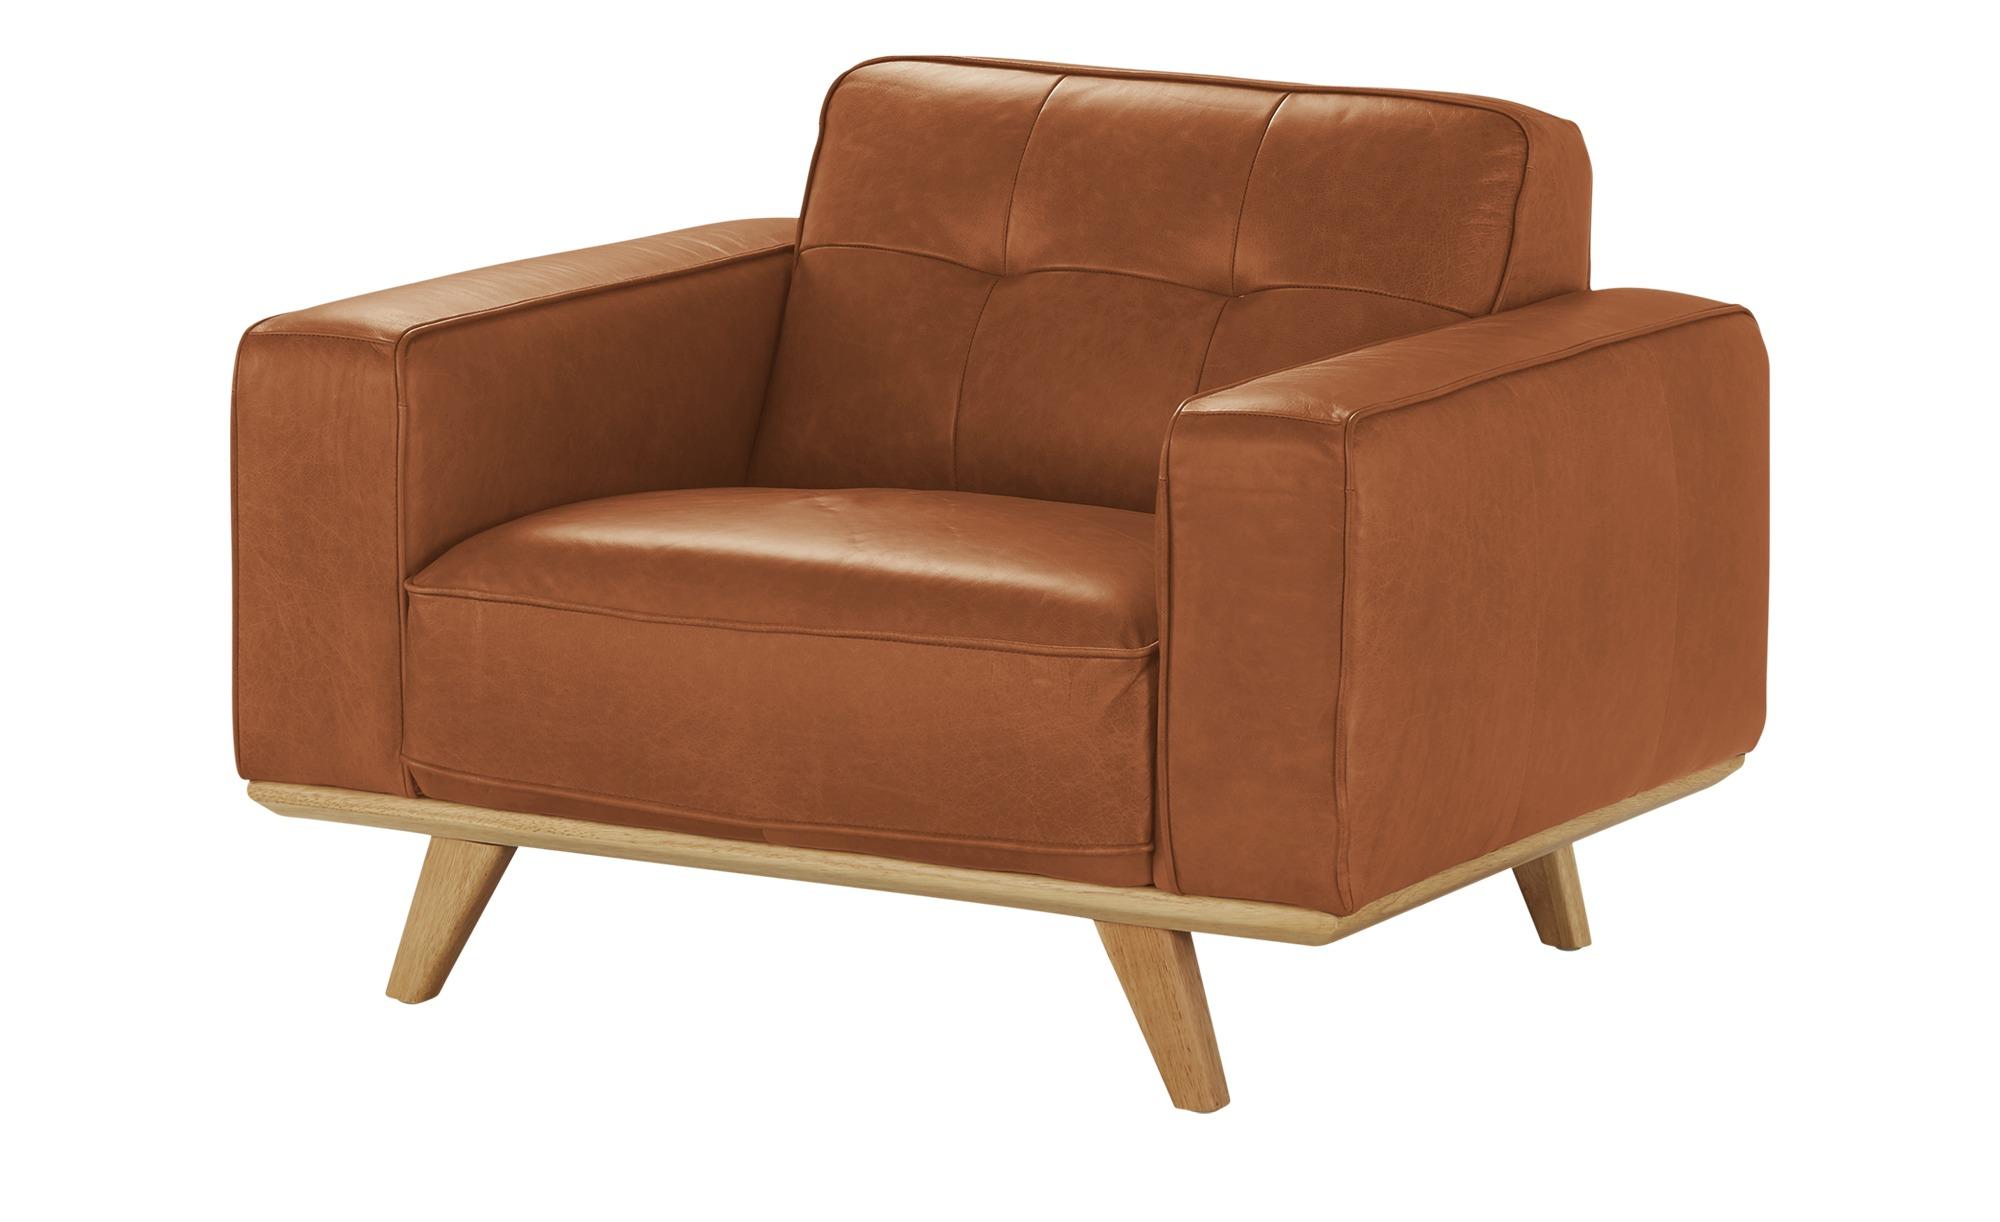 uno Leder Sessel  Caralina ¦ orange ¦ Maße (cm): B: 112 H: 78 T: 95 Polstermöbel > Sessel > Ledersessel - Höffner